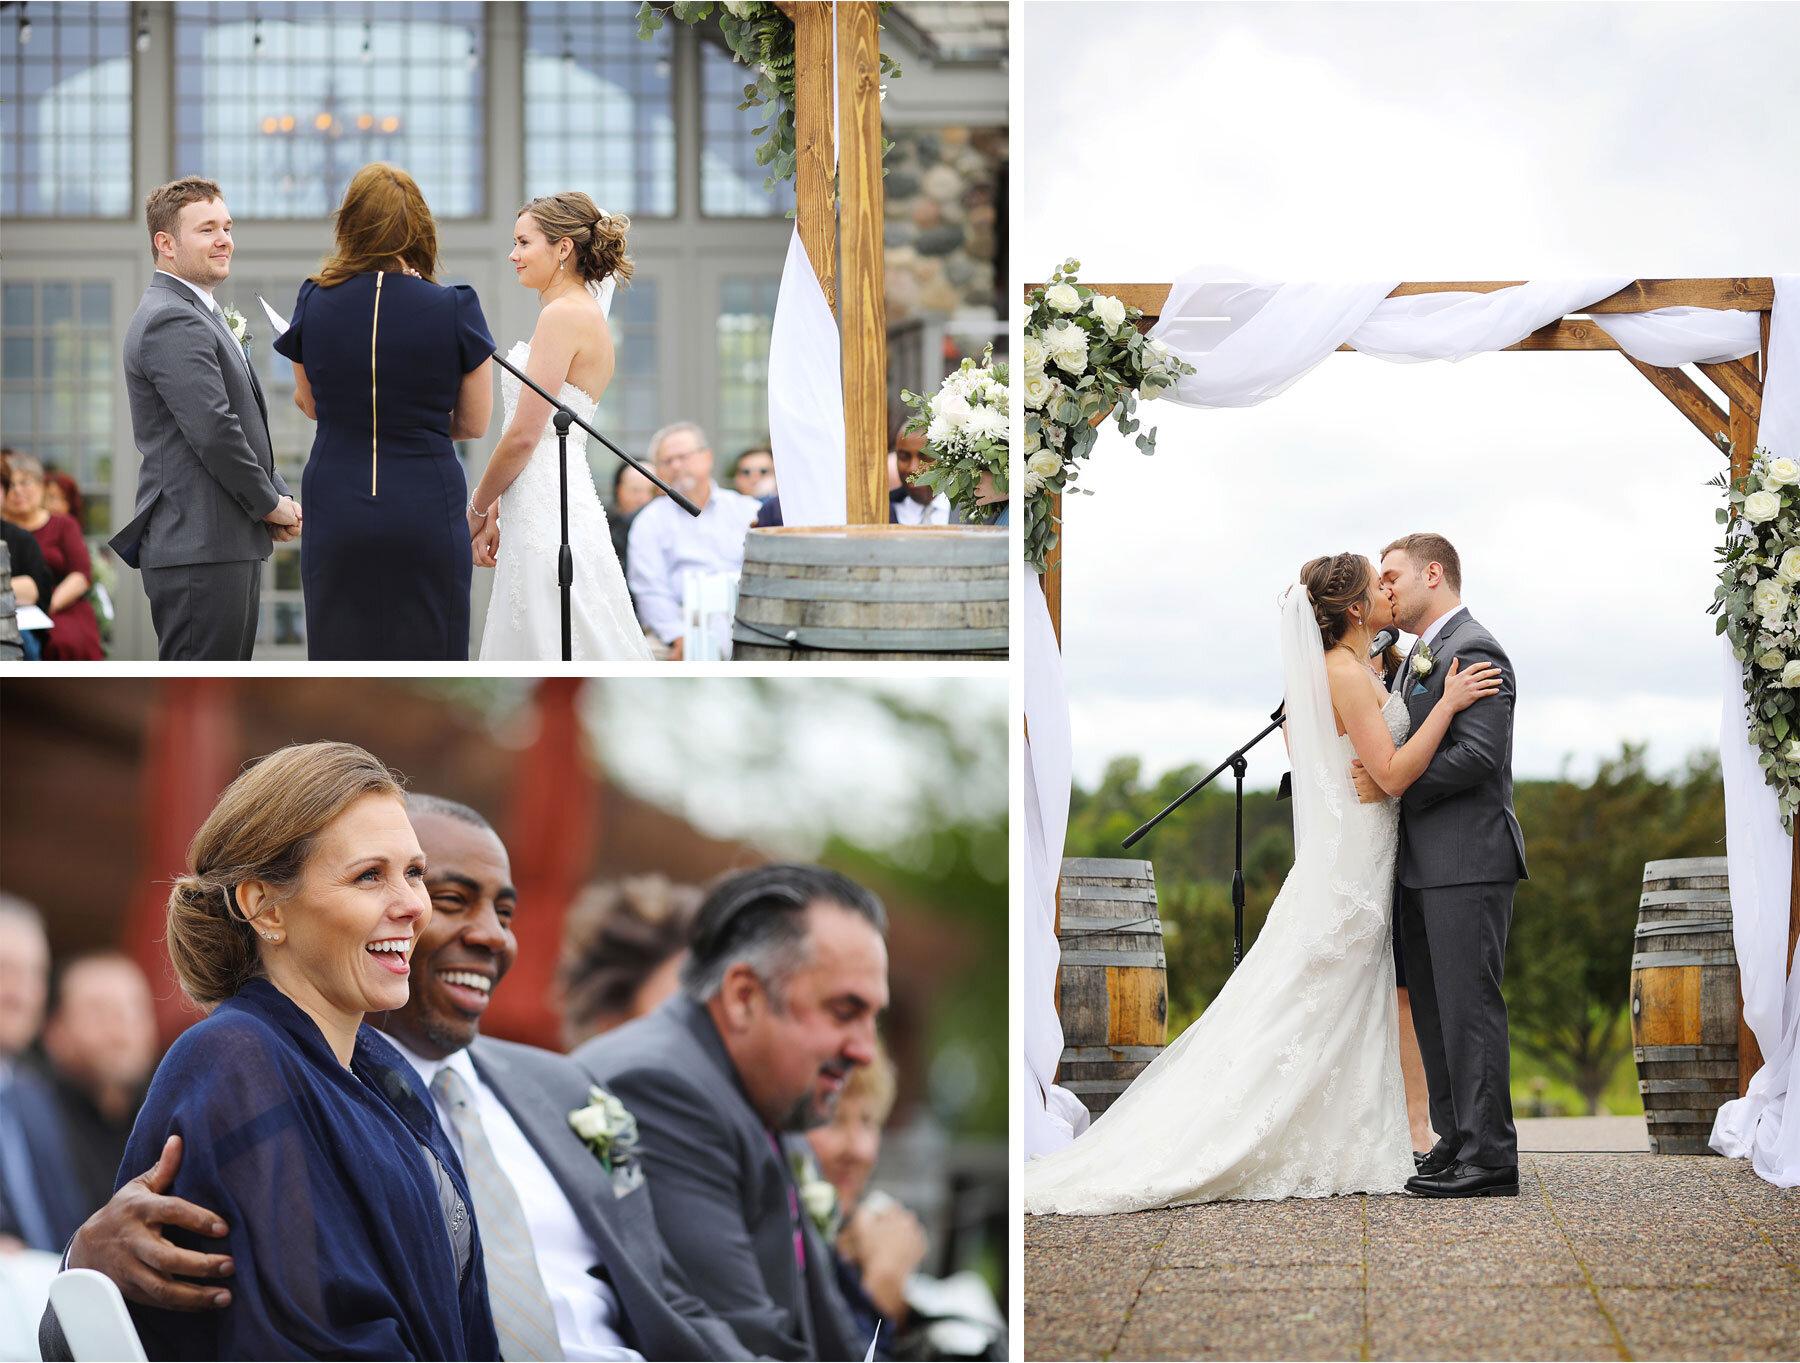 11-Vick-Photography-Minneapolis-Minnesota-Wedding-Rush-Creek-Golf-Club-Ceremony-Outdoor-Bride-Groom-Kiss-Amanda-and-Michael.jpg